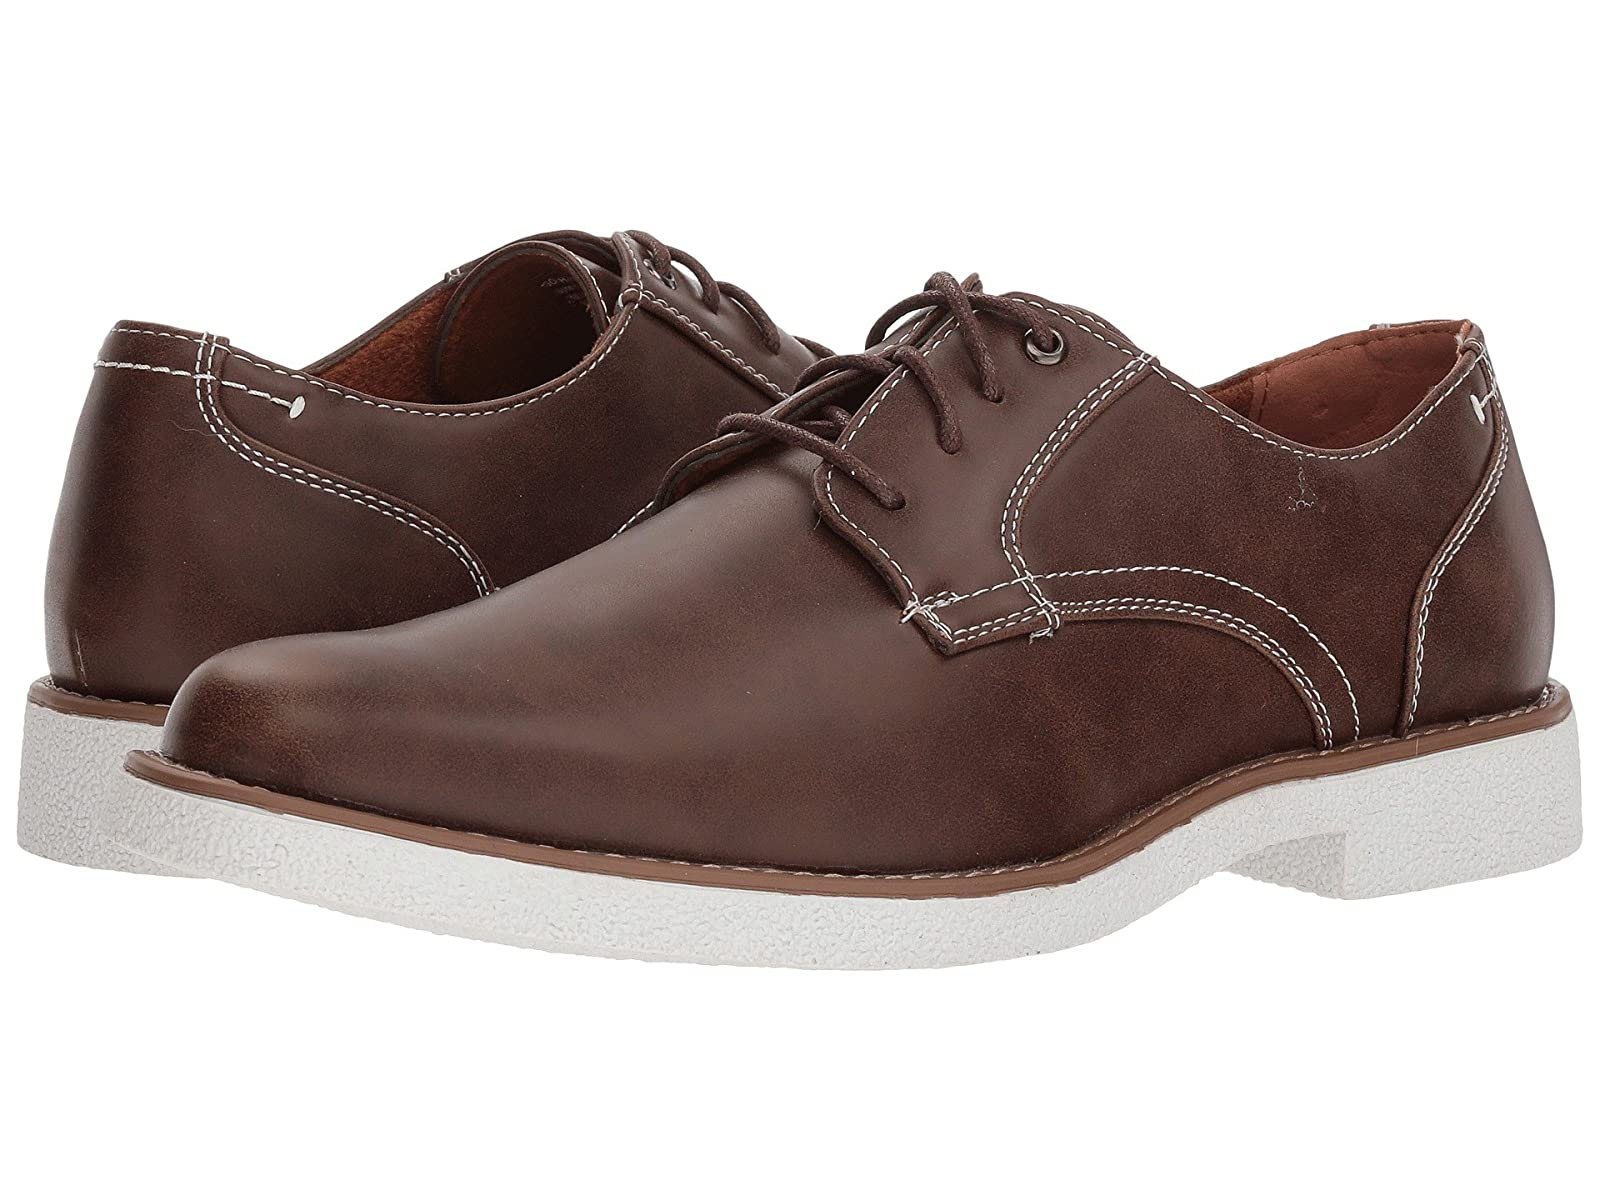 Deer Stags GorhamAtmospheric grades have affordable shoes